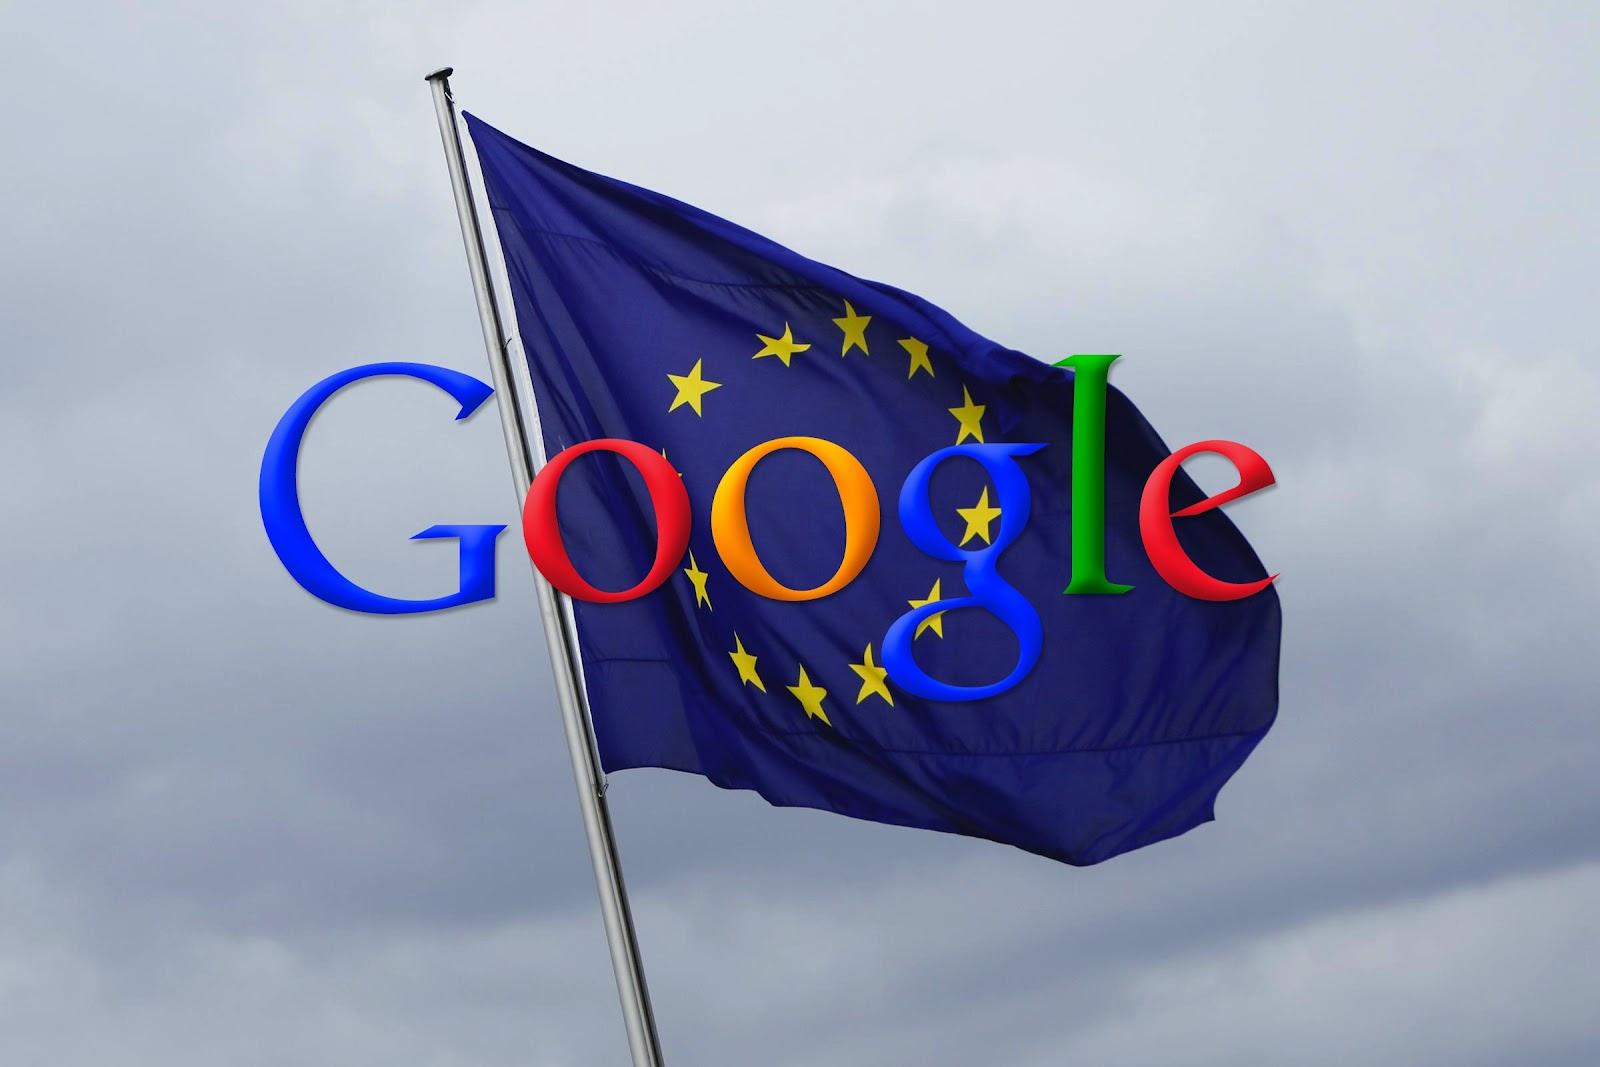 Europa vs Google